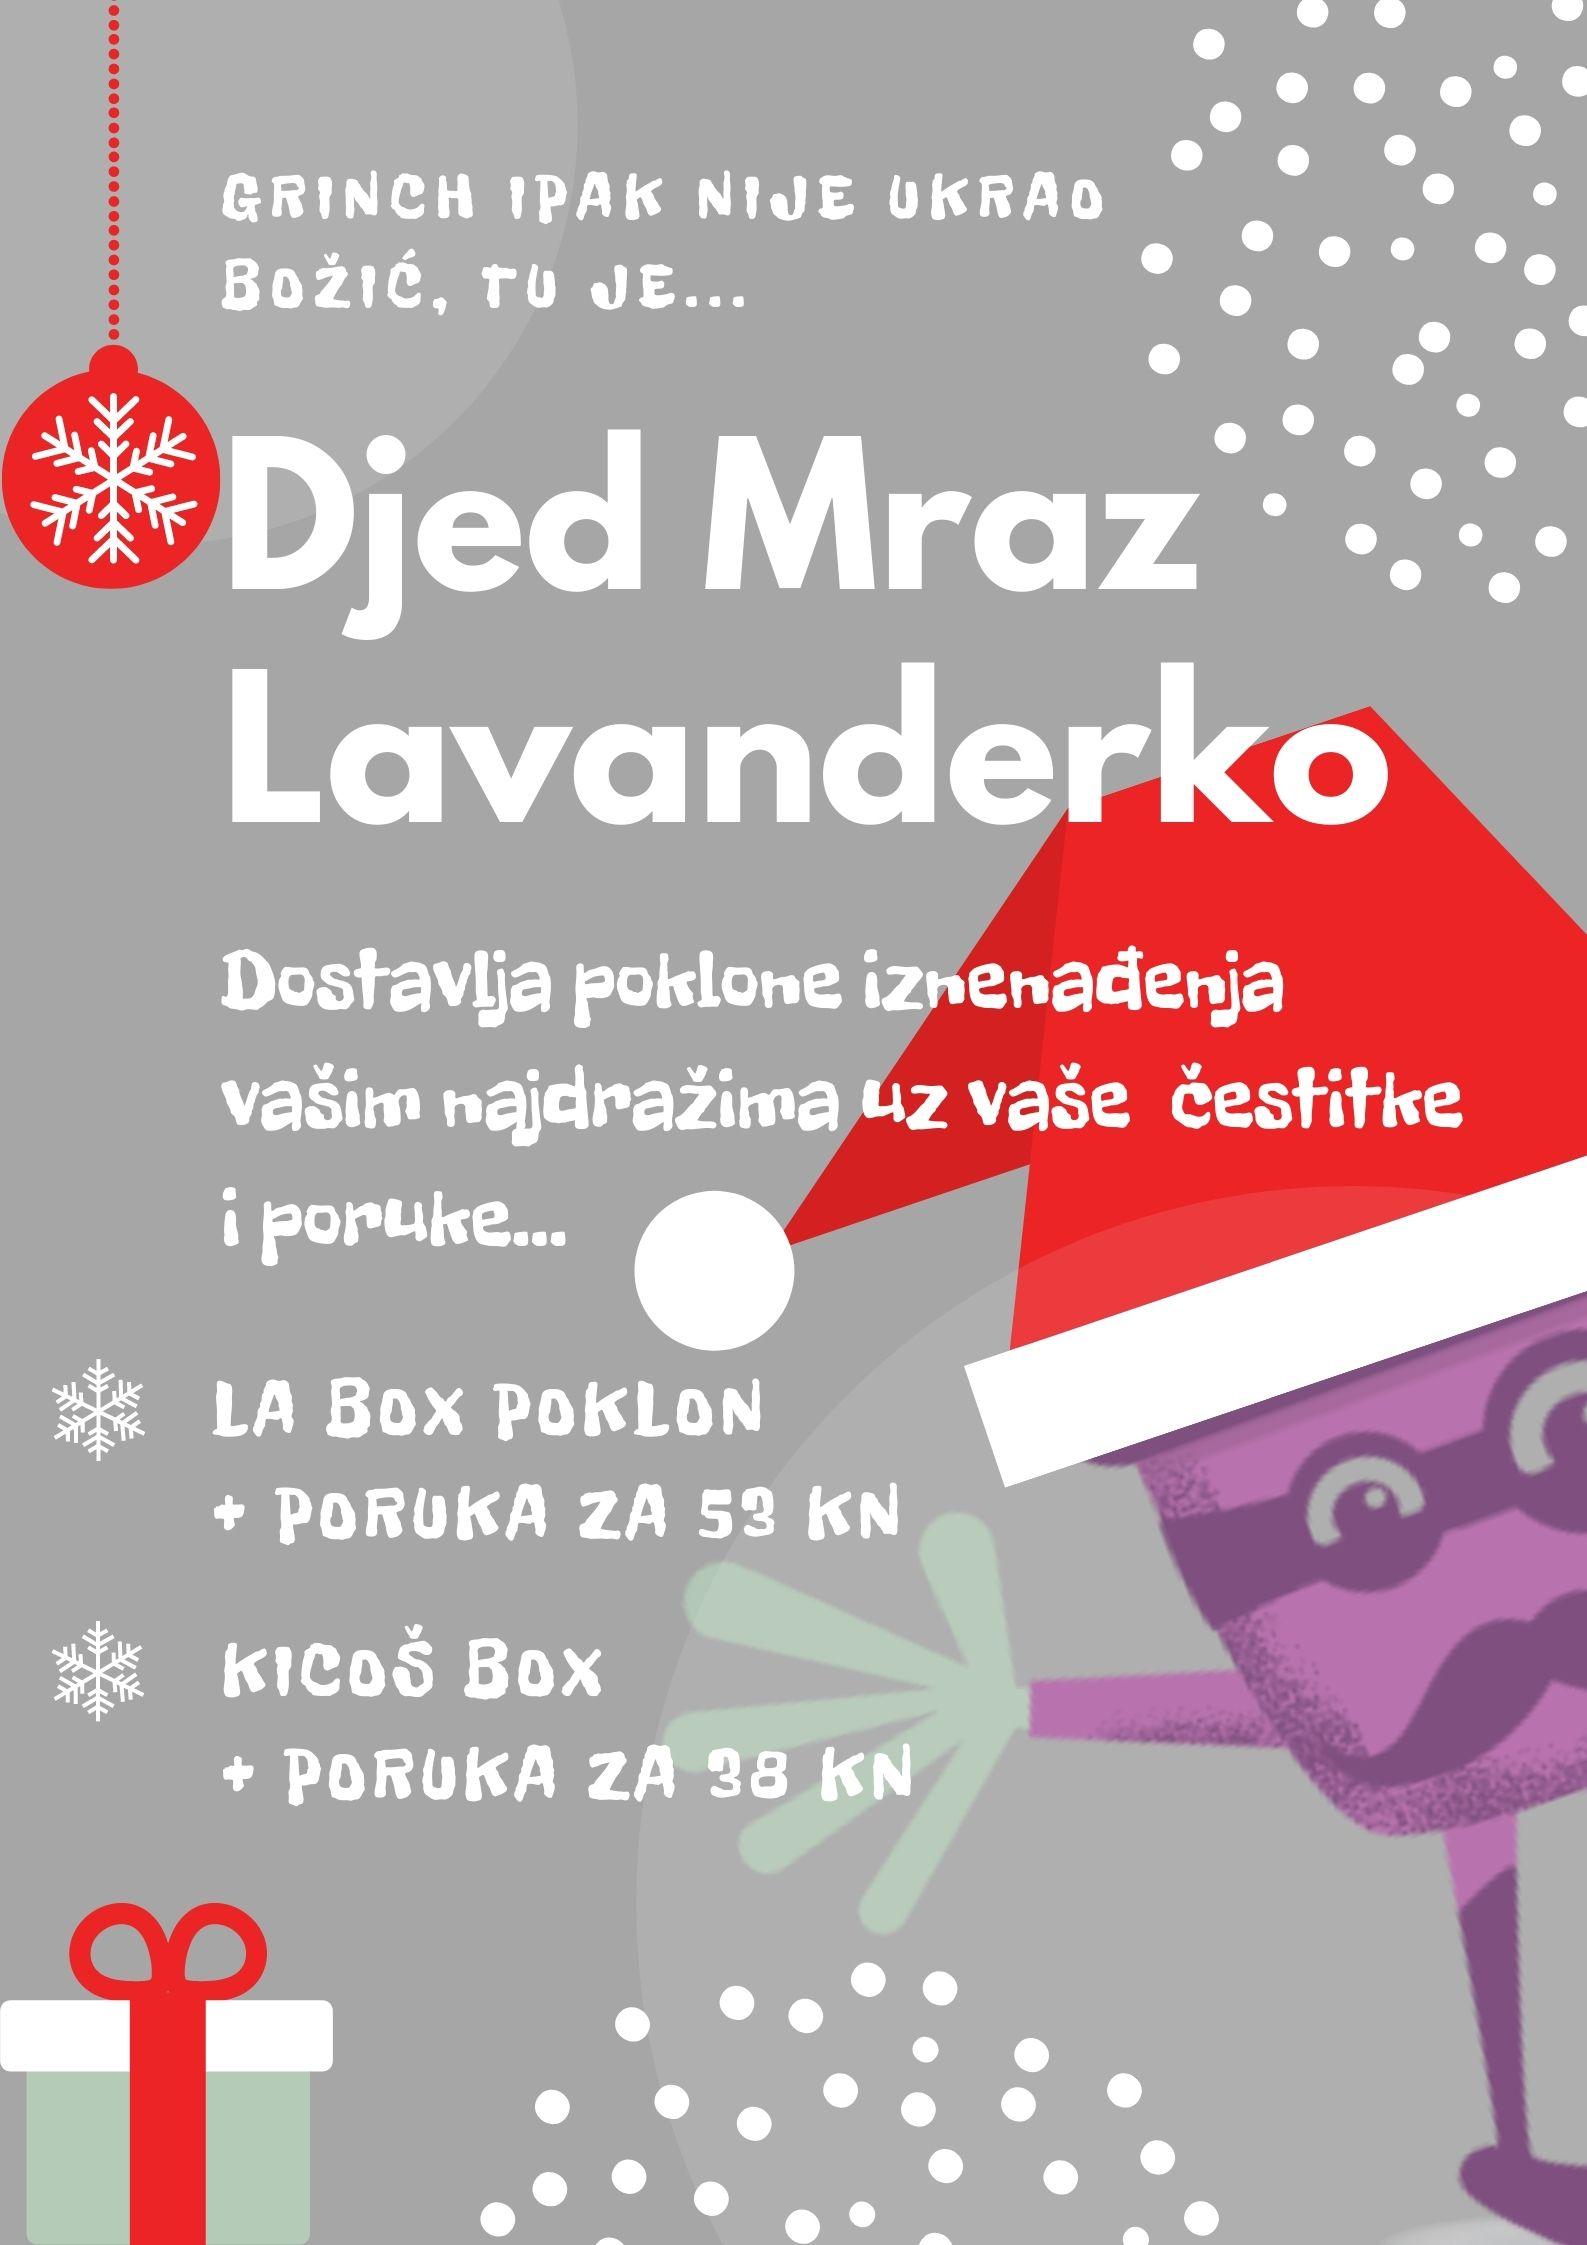 Djed Mraz Lavanderko (1)